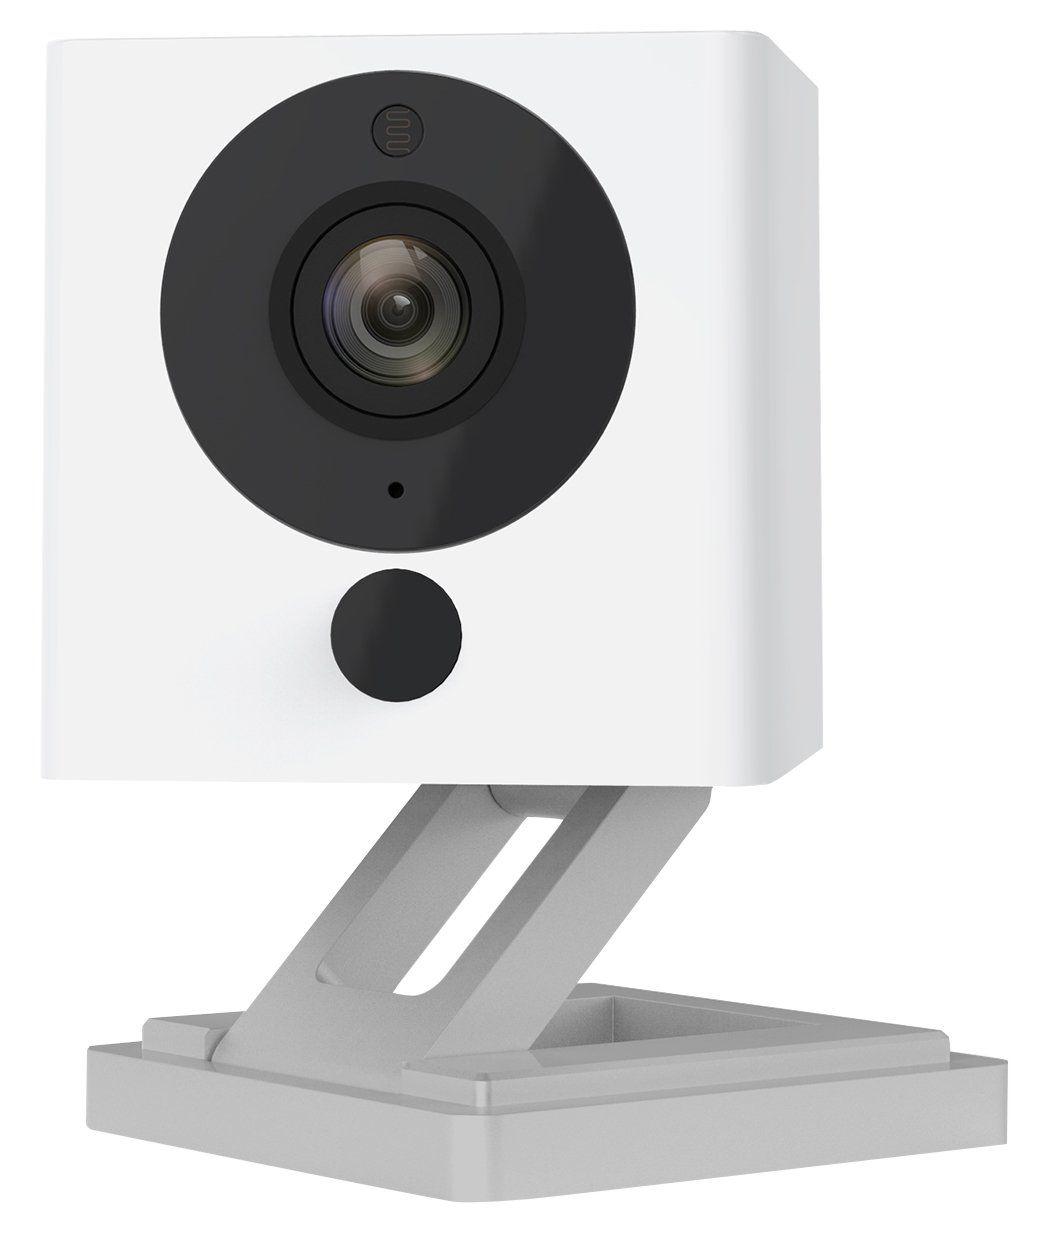 **BRAND NEW** NEST camera Security INDOOR CAM 1080p smart Video works with Alexa